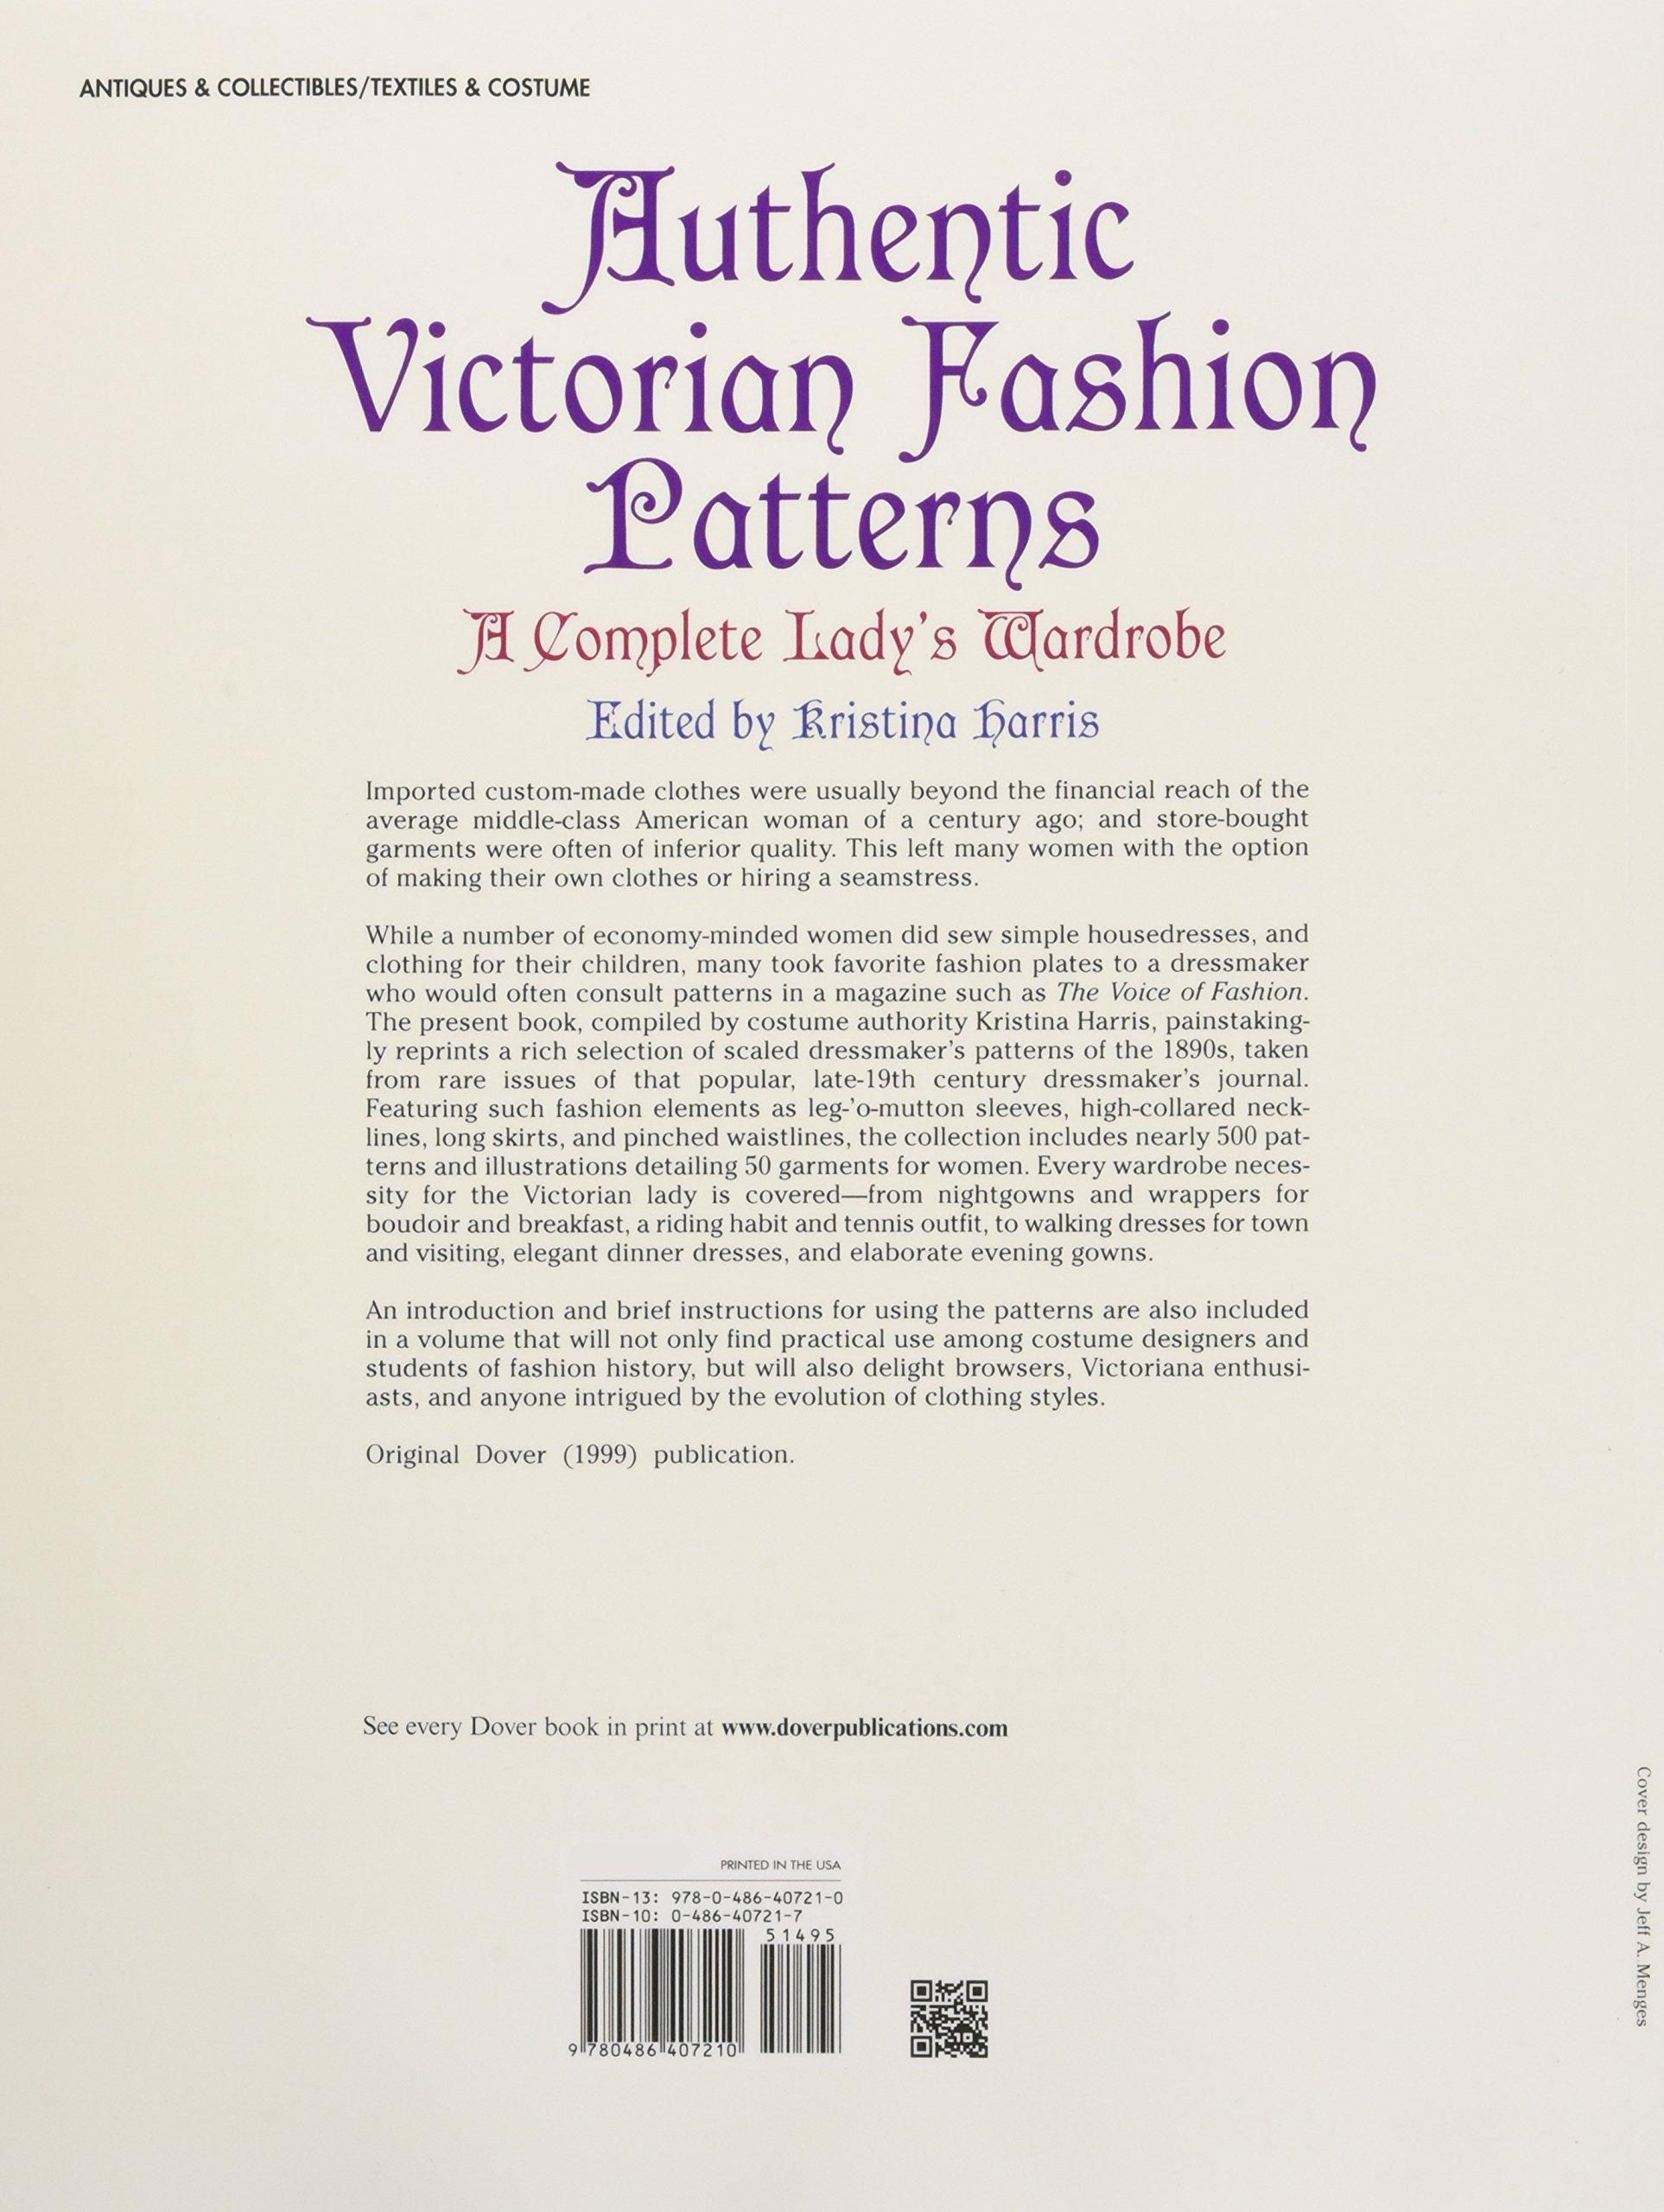 Authentic Victorian Fashion Patterns: Aplete Lady's Wardrobe (dover  Fashion And Costumes): Kristina Harris: 9780486407210: Amazon: Books